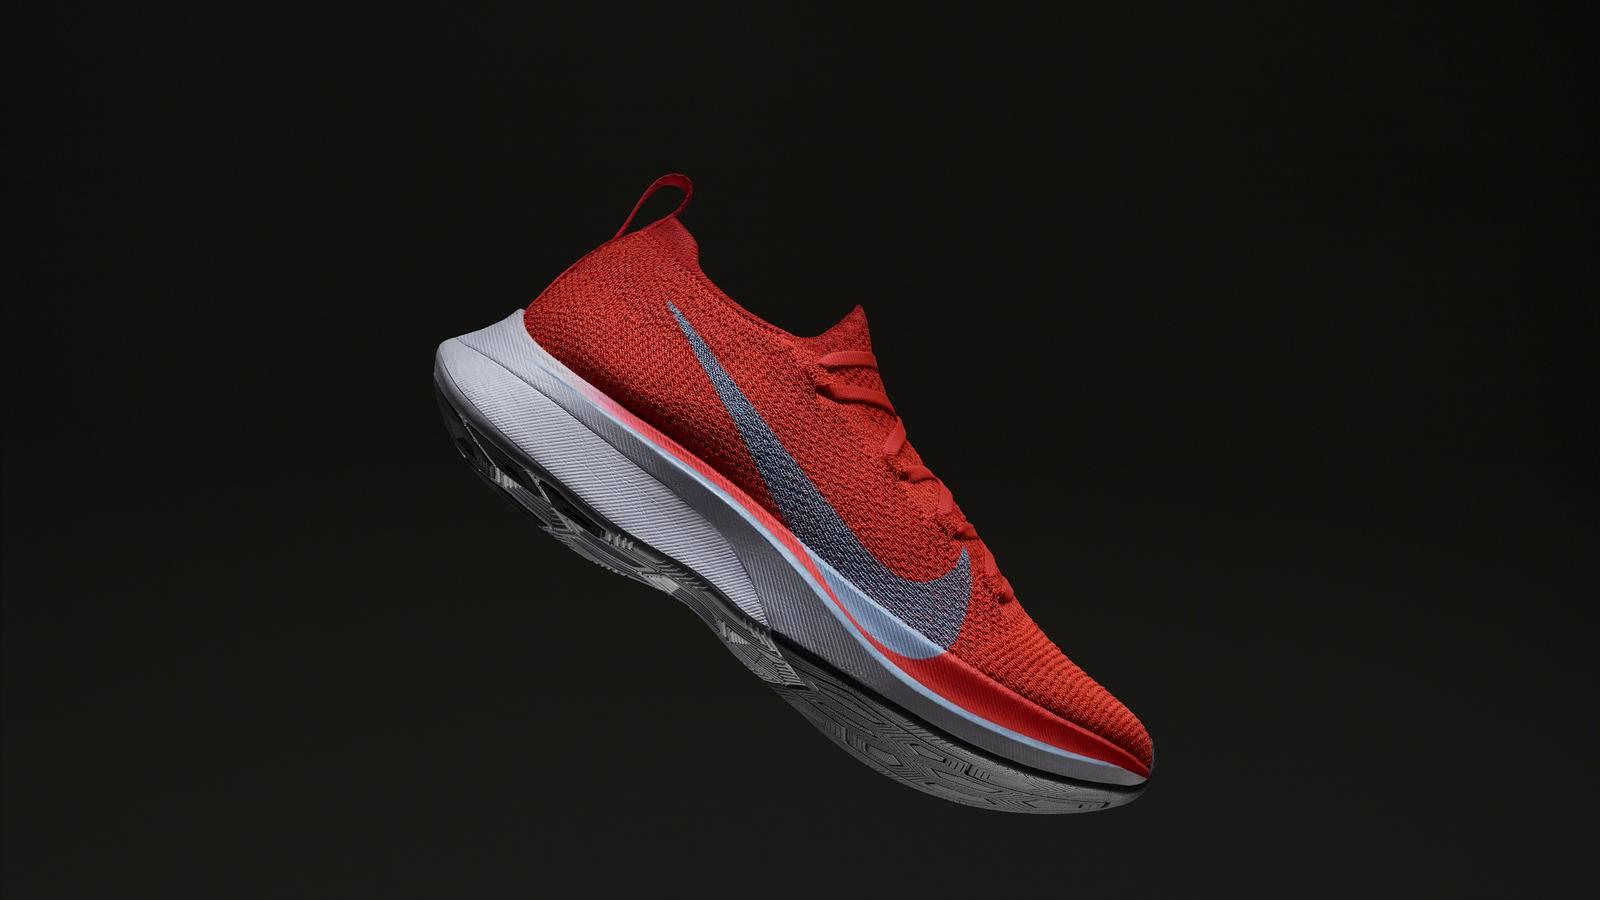 Nike Zoom Vaporfly 4% - Stone Forest